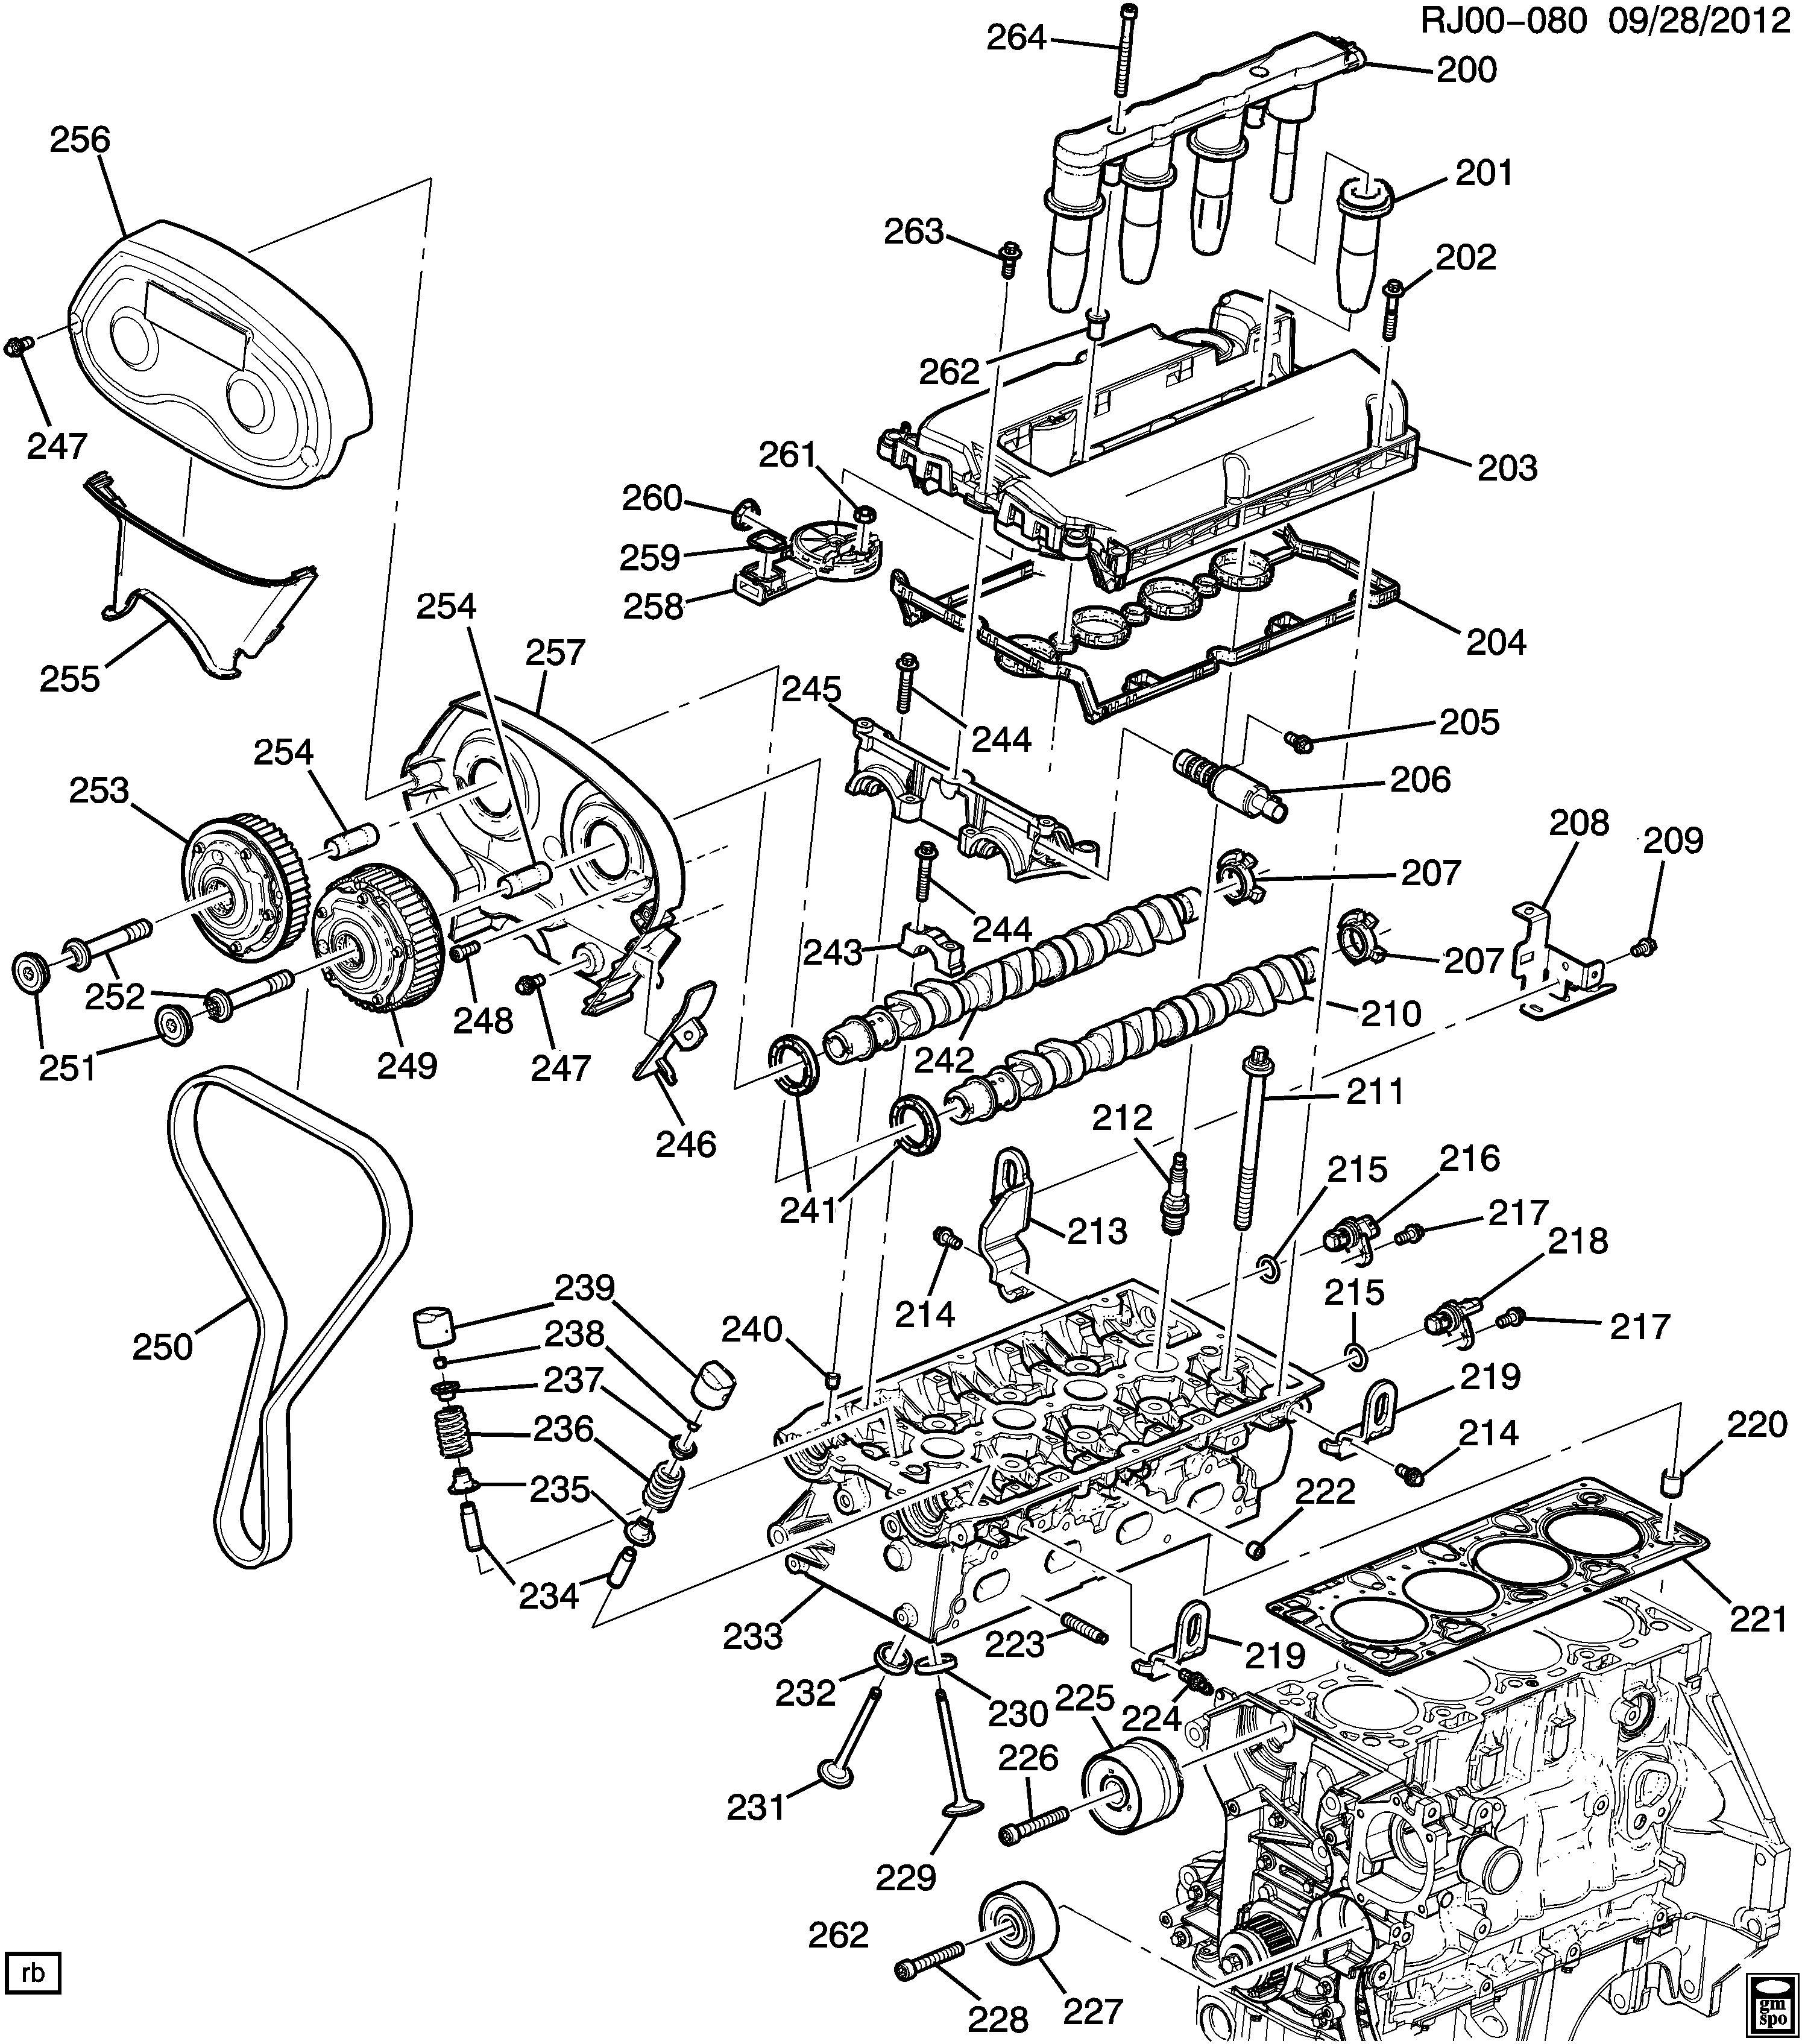 Chevrolet Cruze Bolt Ignition Coil Mounting Bolt